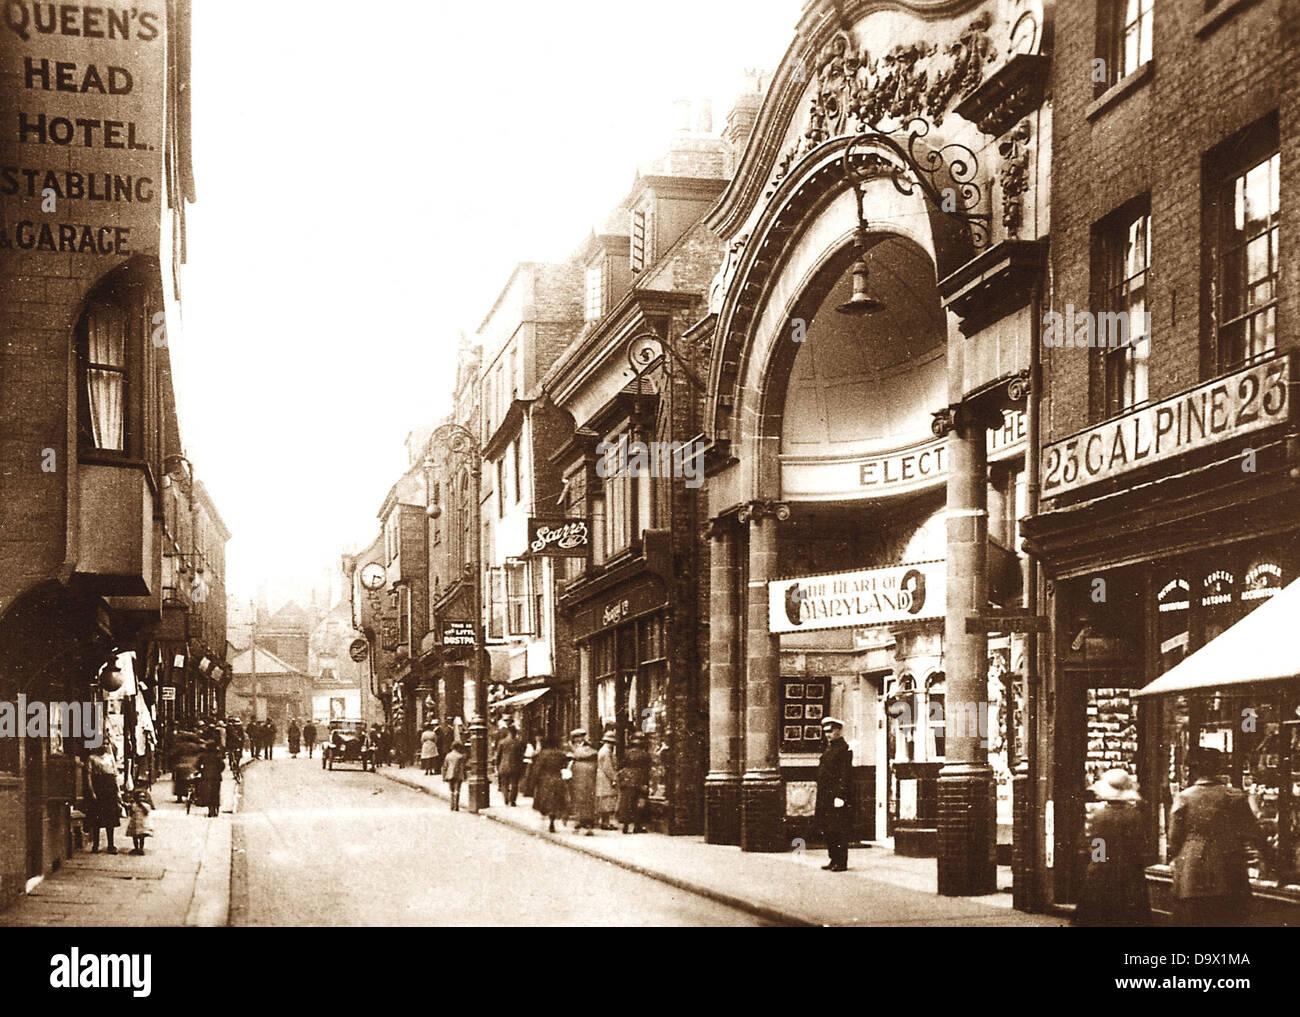 York Electric Cinema Fossgate early 1900s - Stock Image